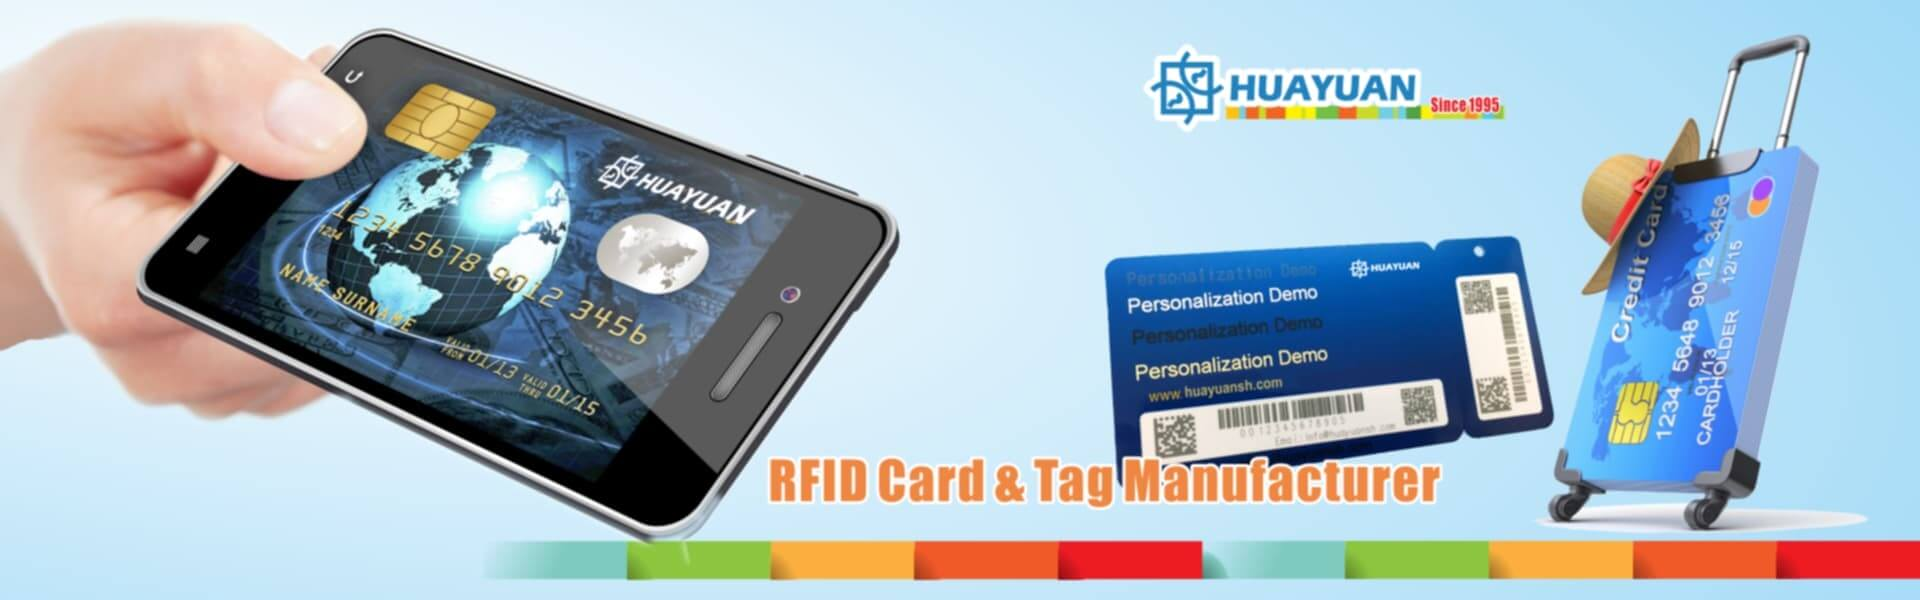 HUAYUAN RFID Card